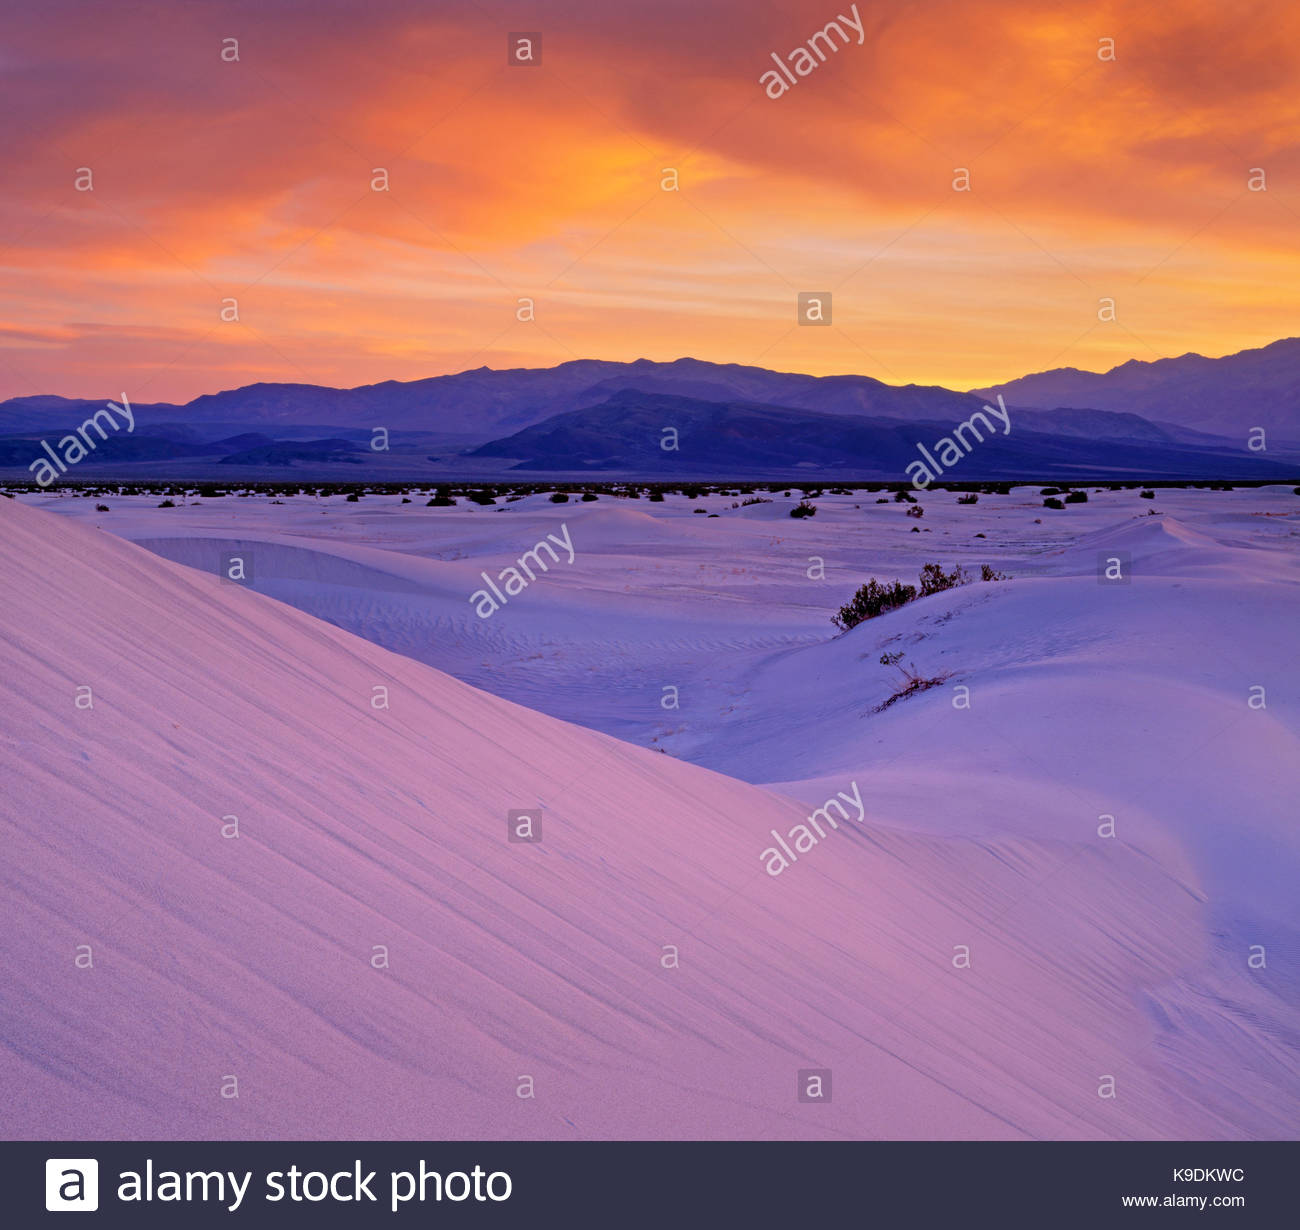 Saline Dunes at Dawn, Saline Valley Wilderness, Death Valley National Park, California - Stock Image